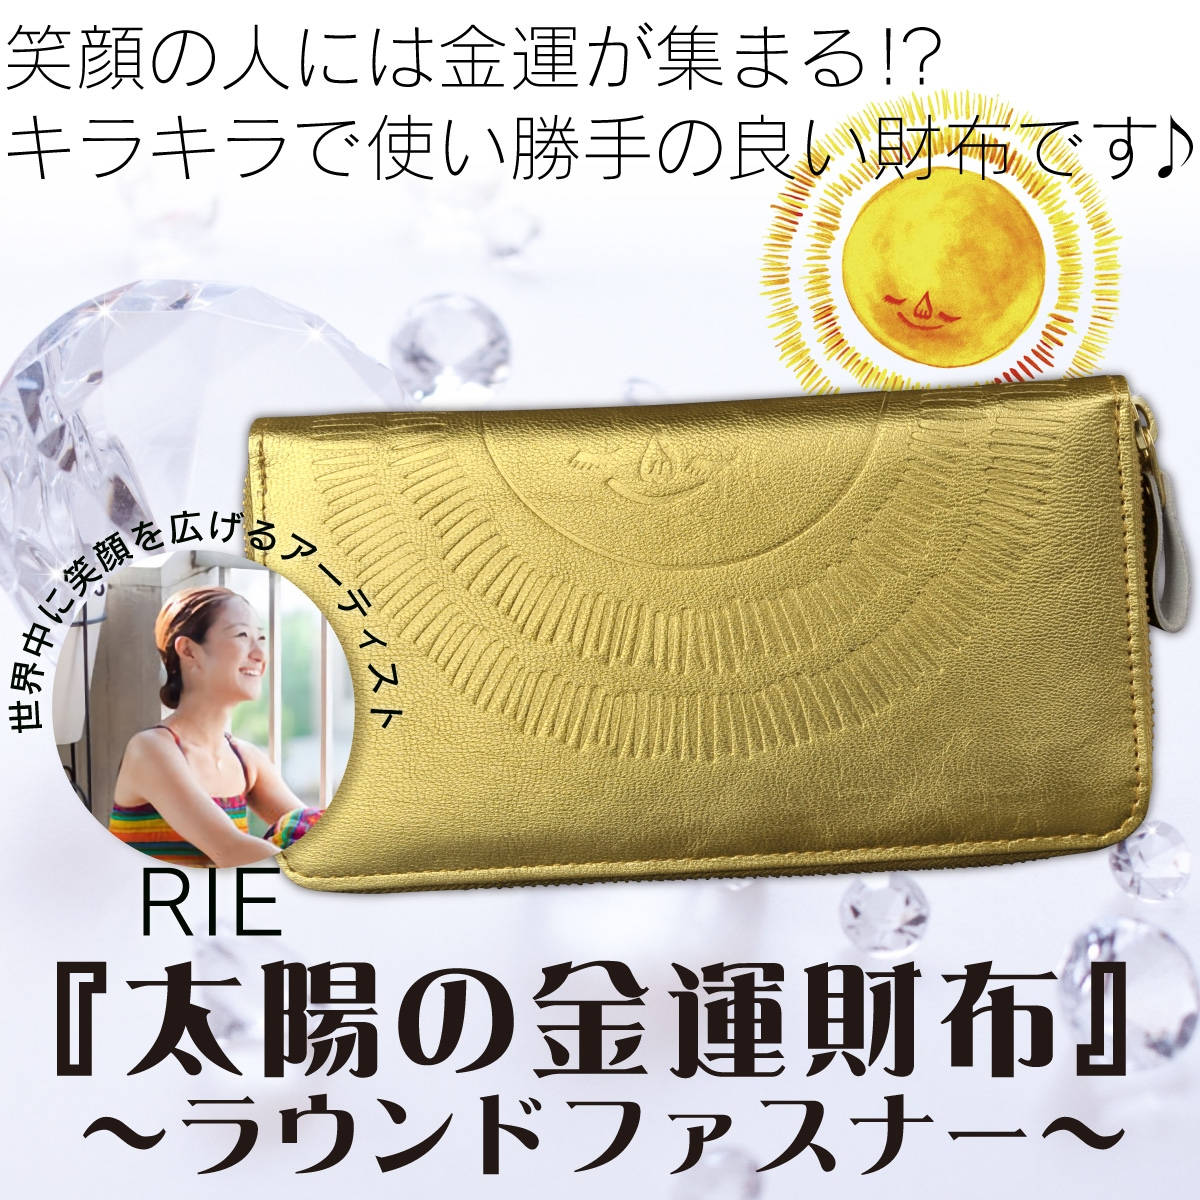 RIEの『太陽の金運財布ラウンド』 開運グッズ